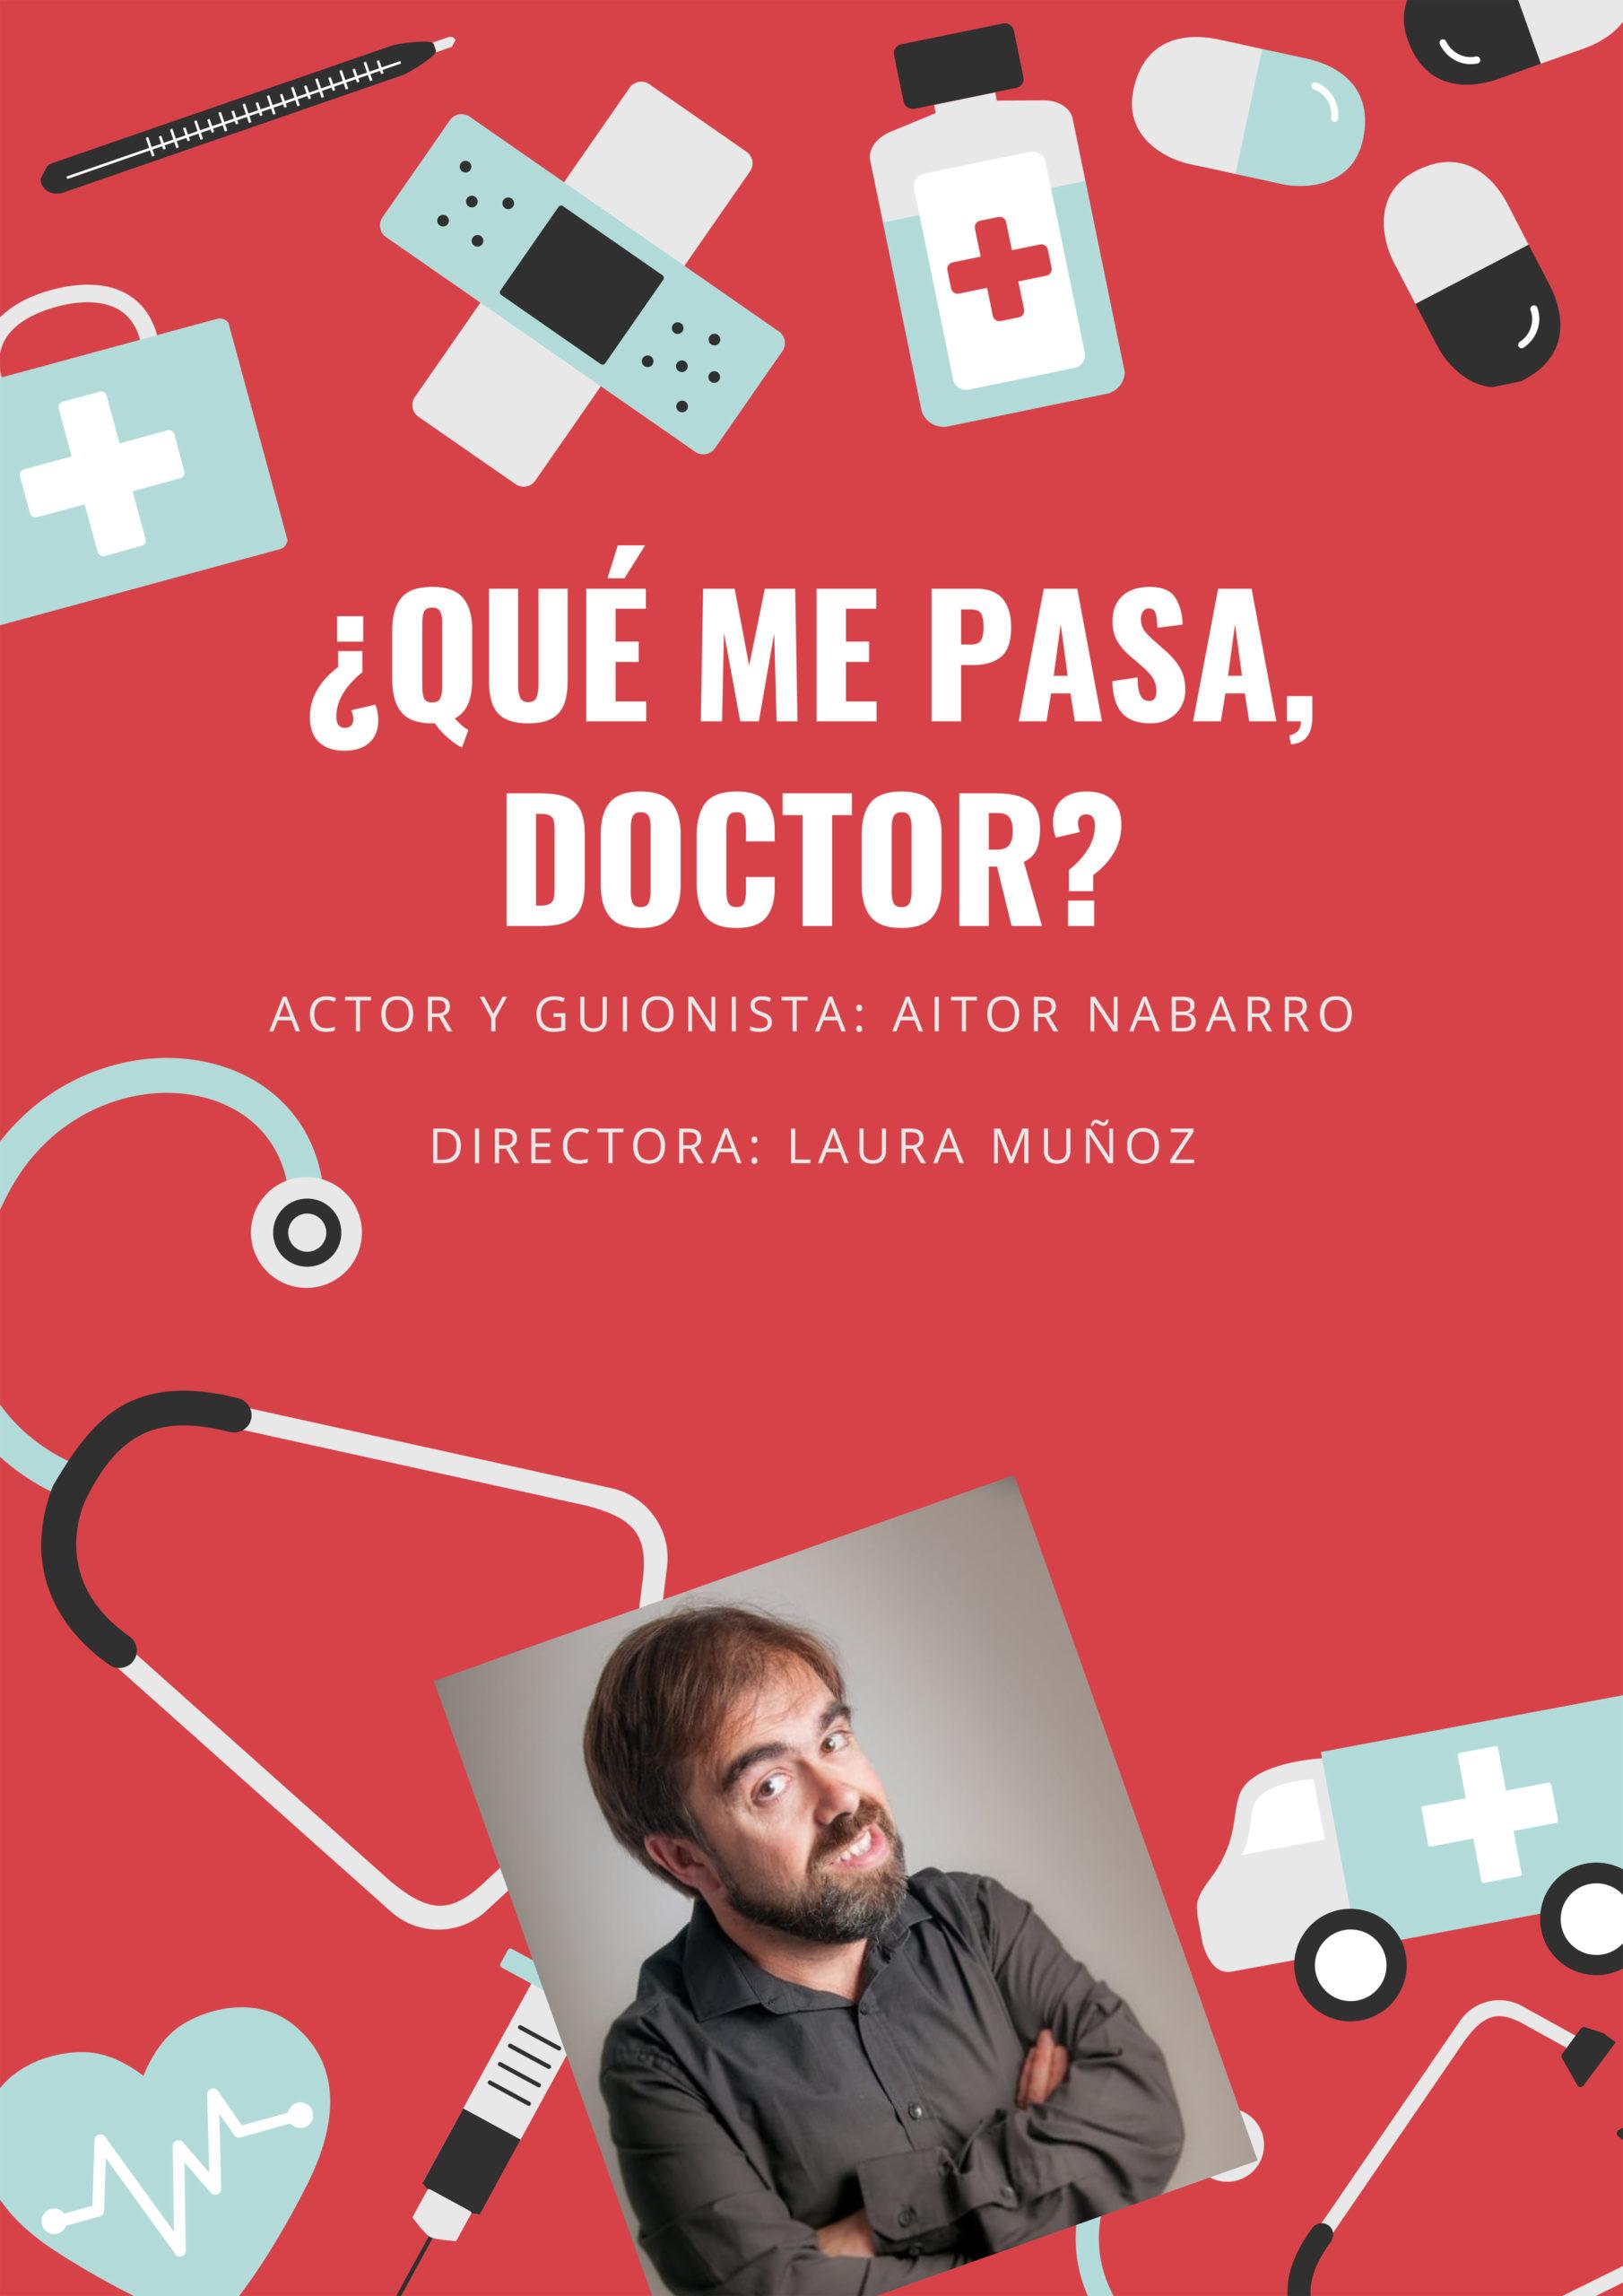 ¿QUÉ ME PASA, DOCTOR?